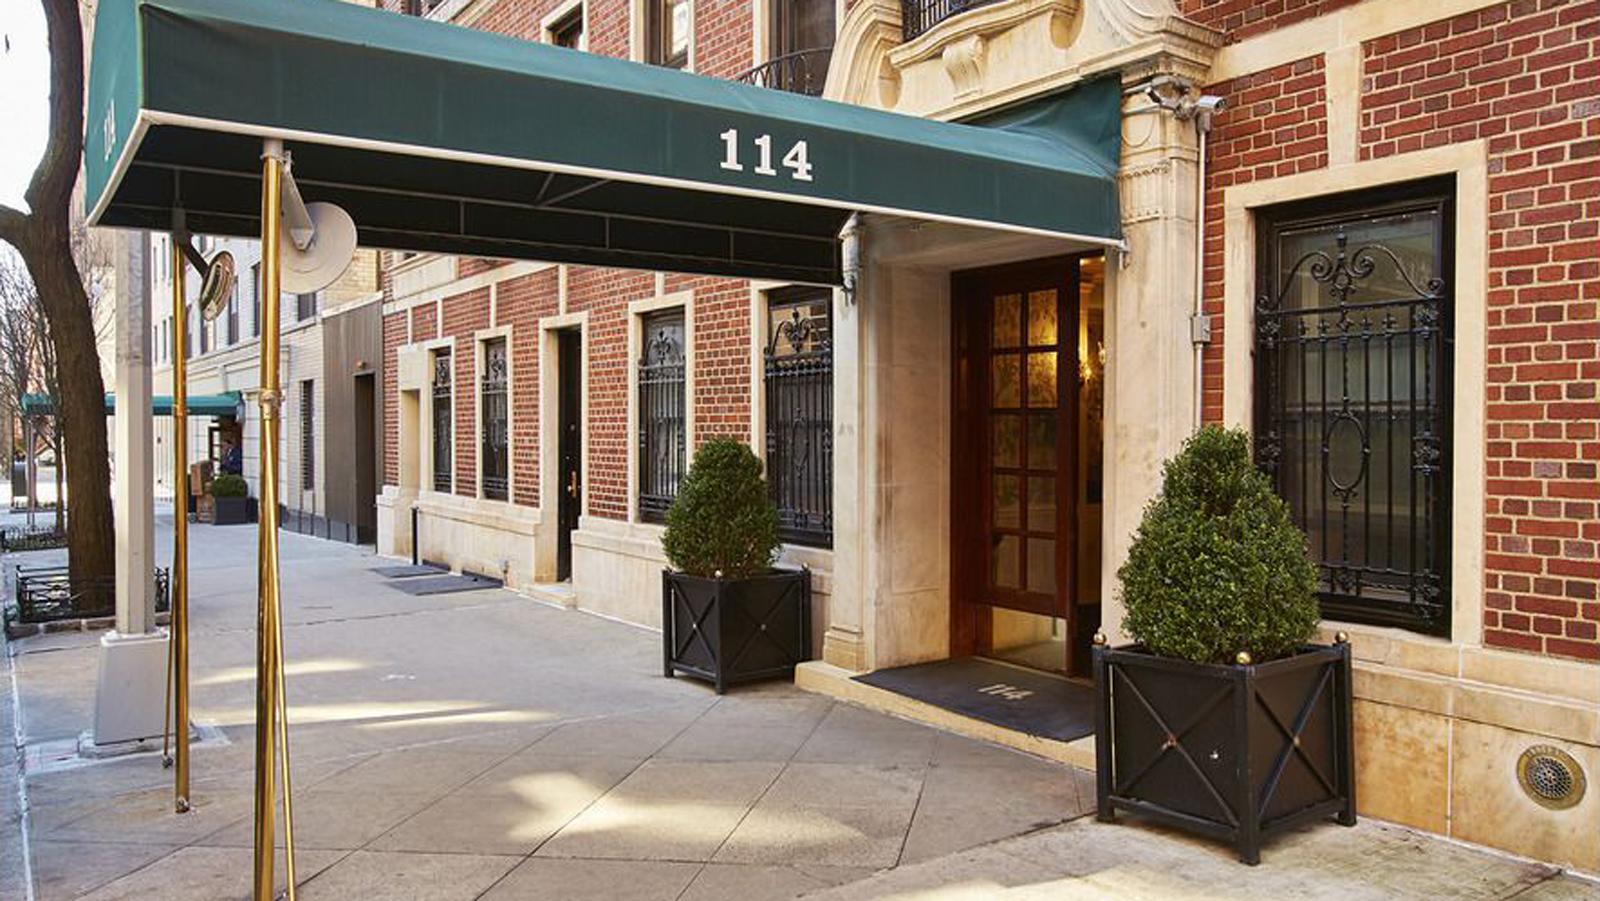 114 East 90th Street